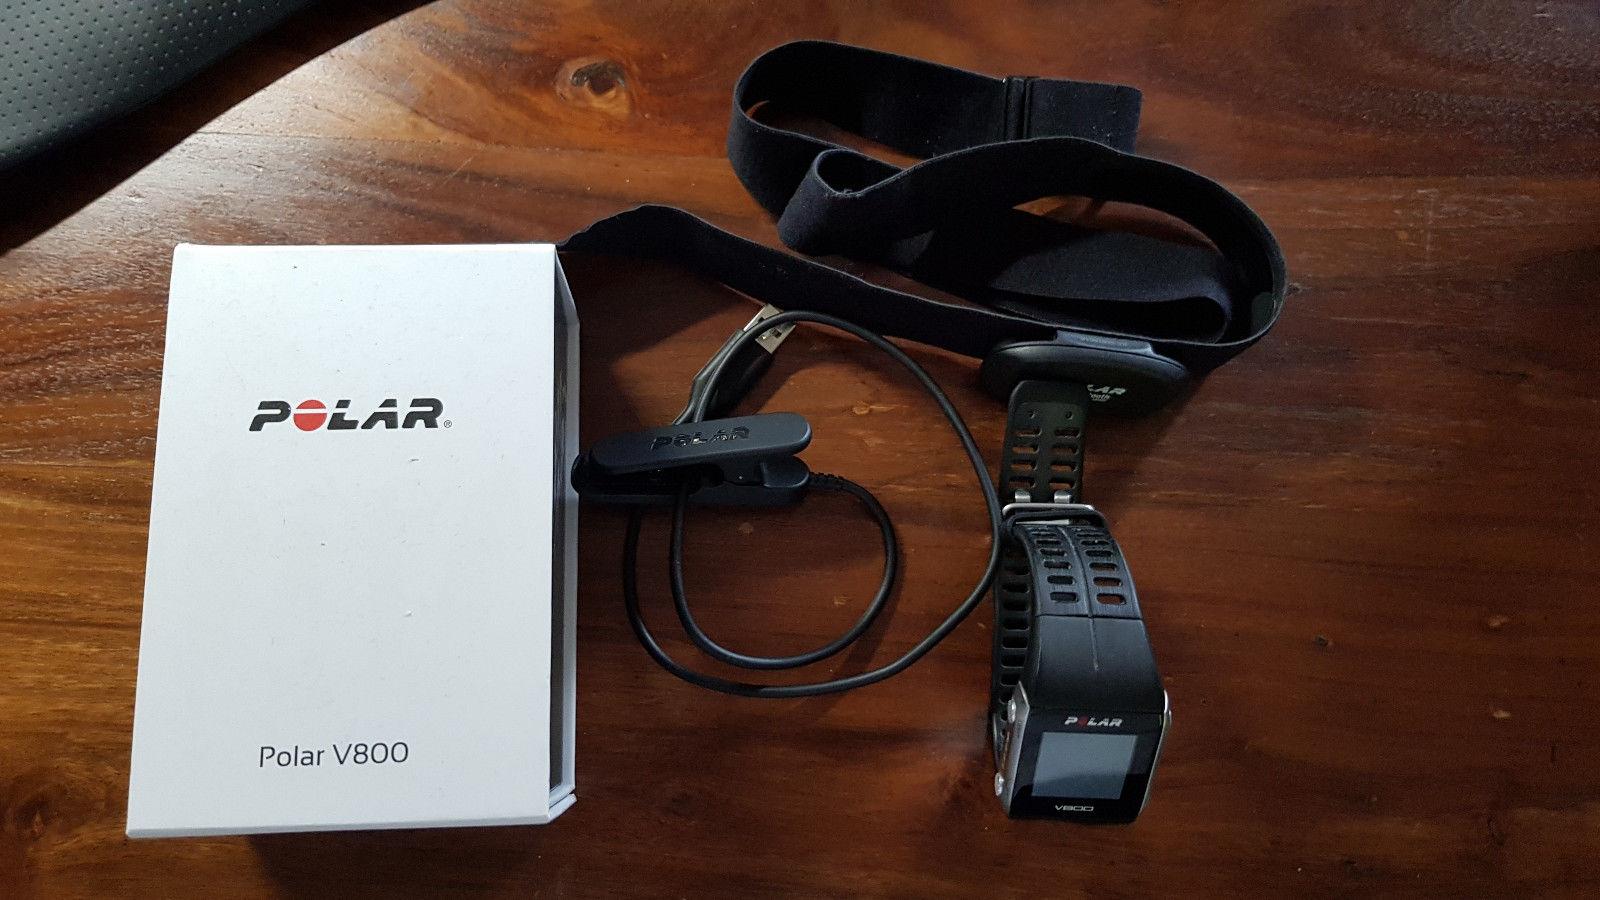 Polar V800 Fitness Uhr GPS-Tracking neues Modell mit Brustgurt sehr guter Zustan